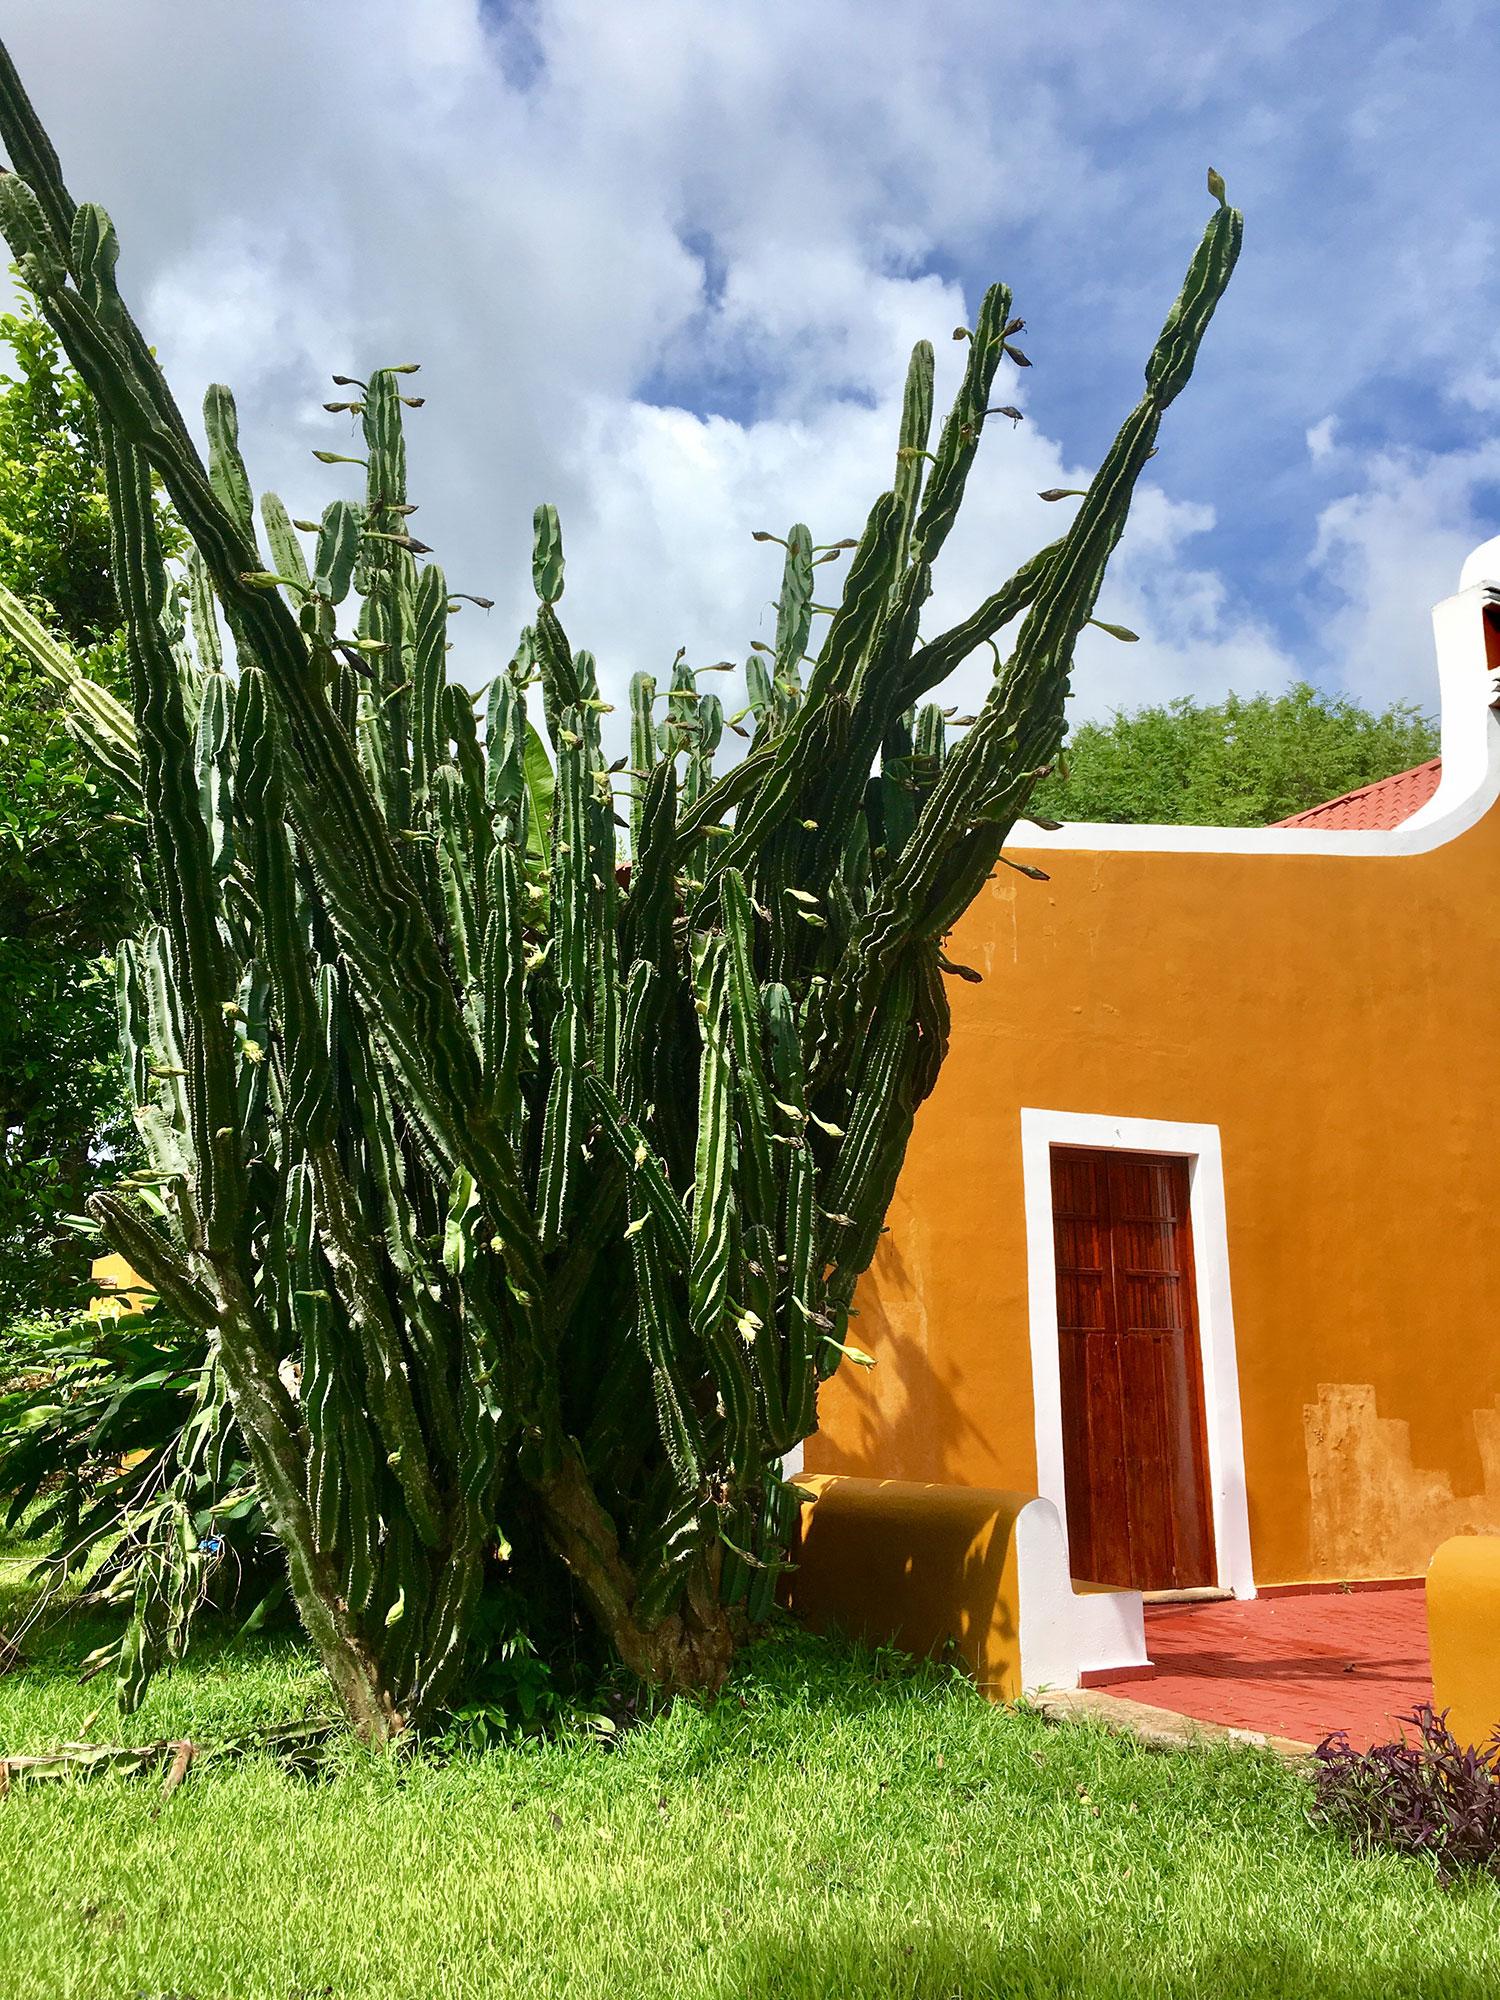 The hacienda gate with the volcano Popocatépetl behind.